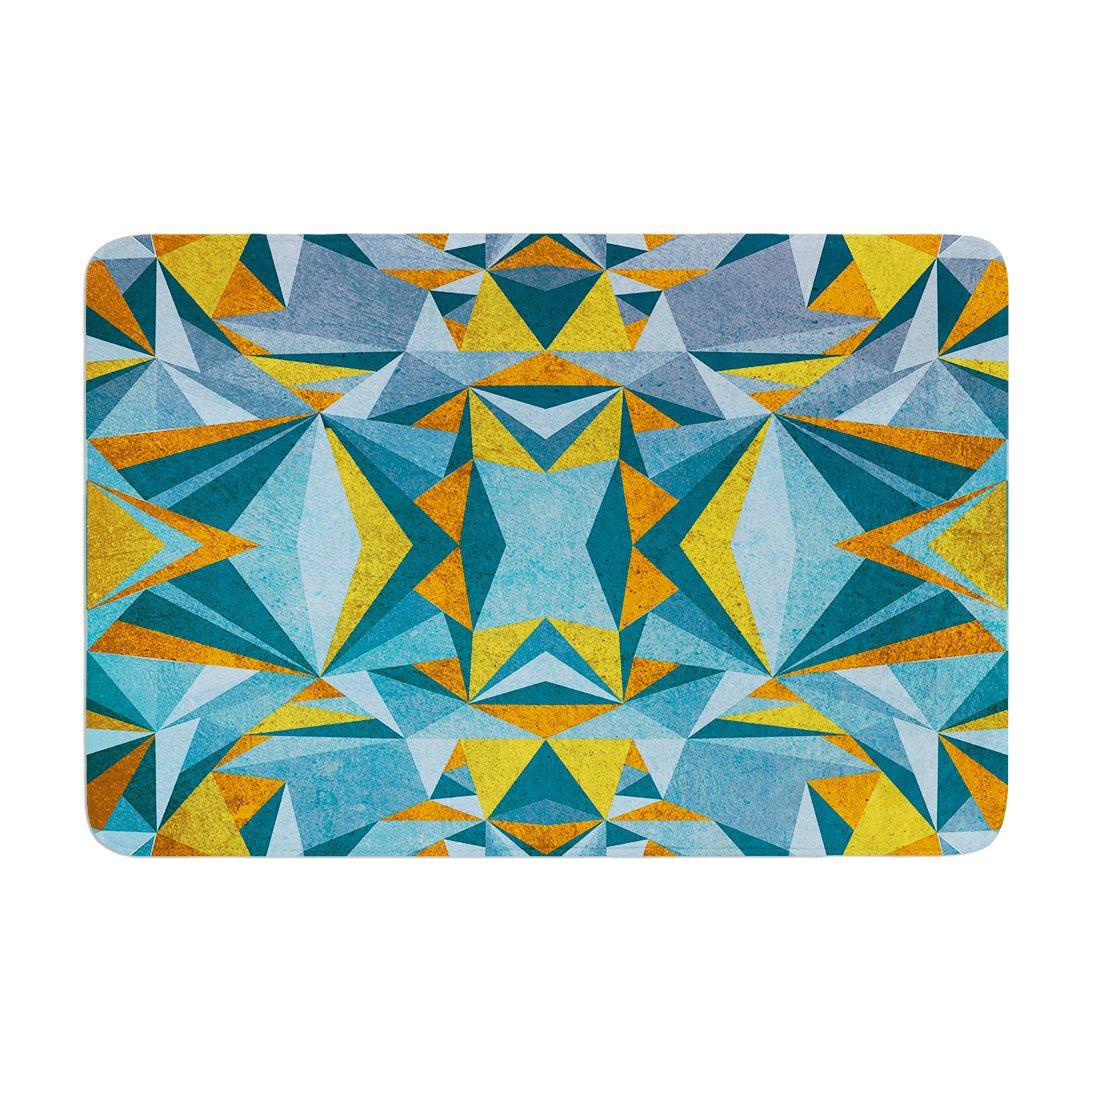 Kess InHouse Nika Martinez Abstraction Blue /& Gold Memory Foam Bath Mat 17 by 24